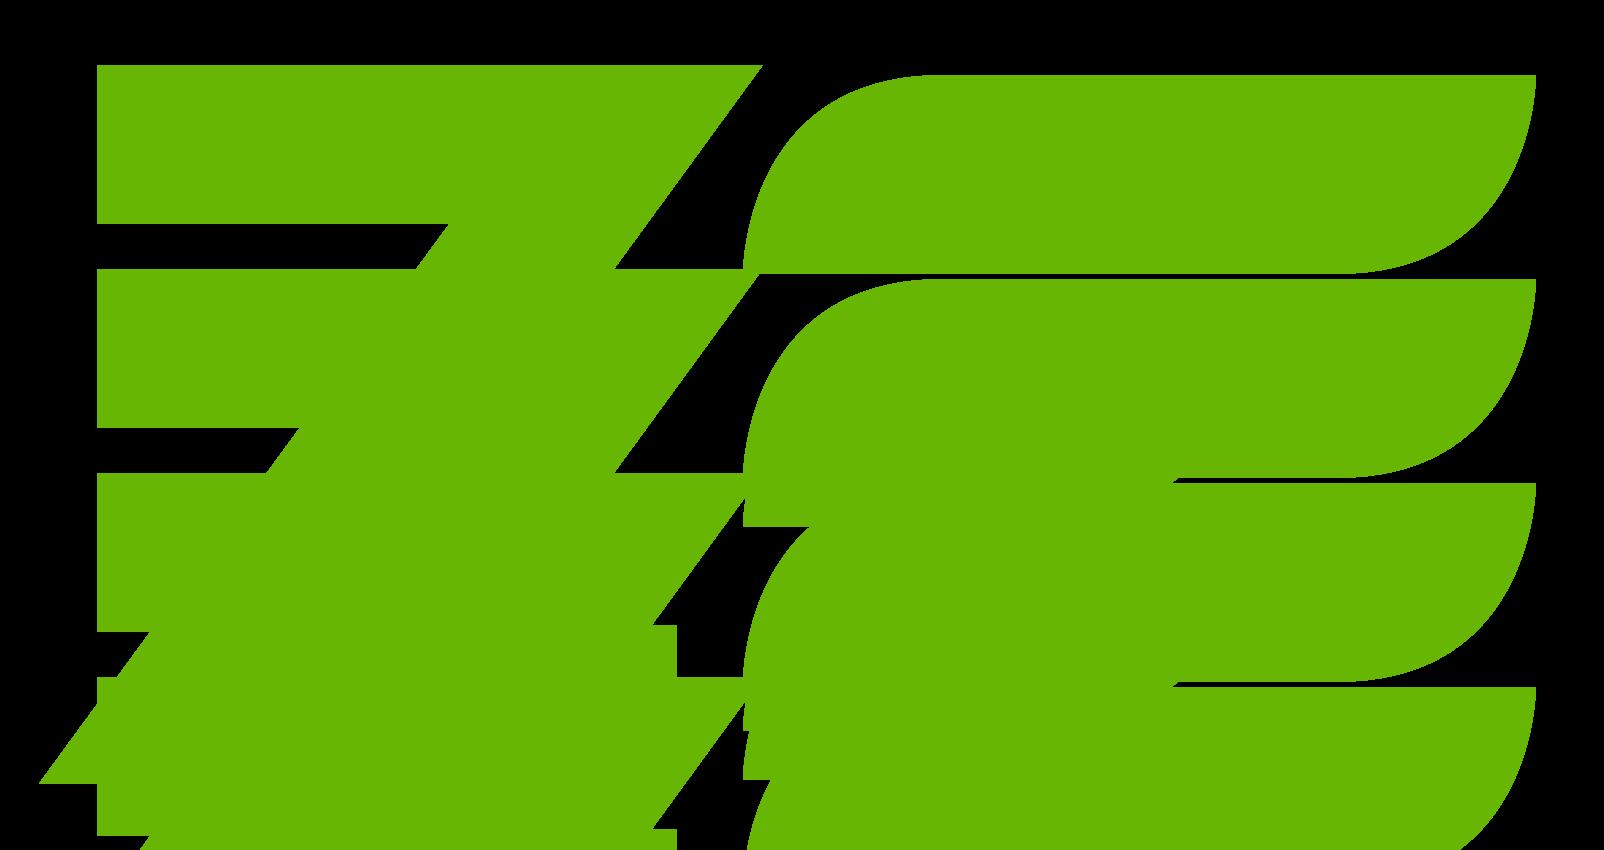 ZF Logo Vector Wallpaper